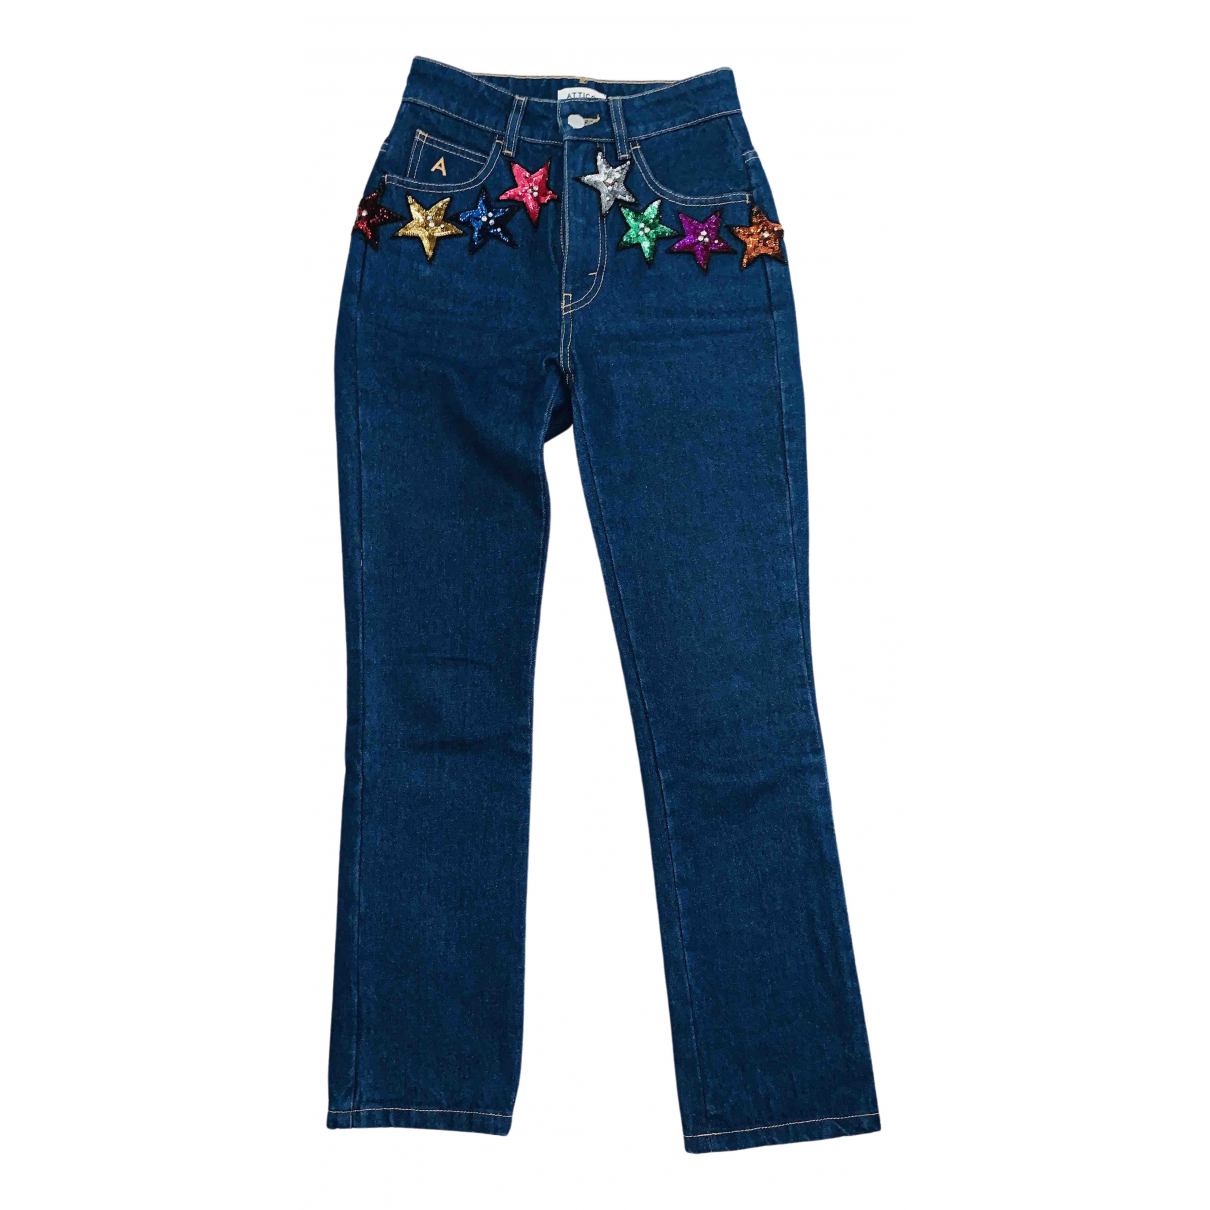 Attico \N Blue Denim - Jeans Trousers for Women 1 US